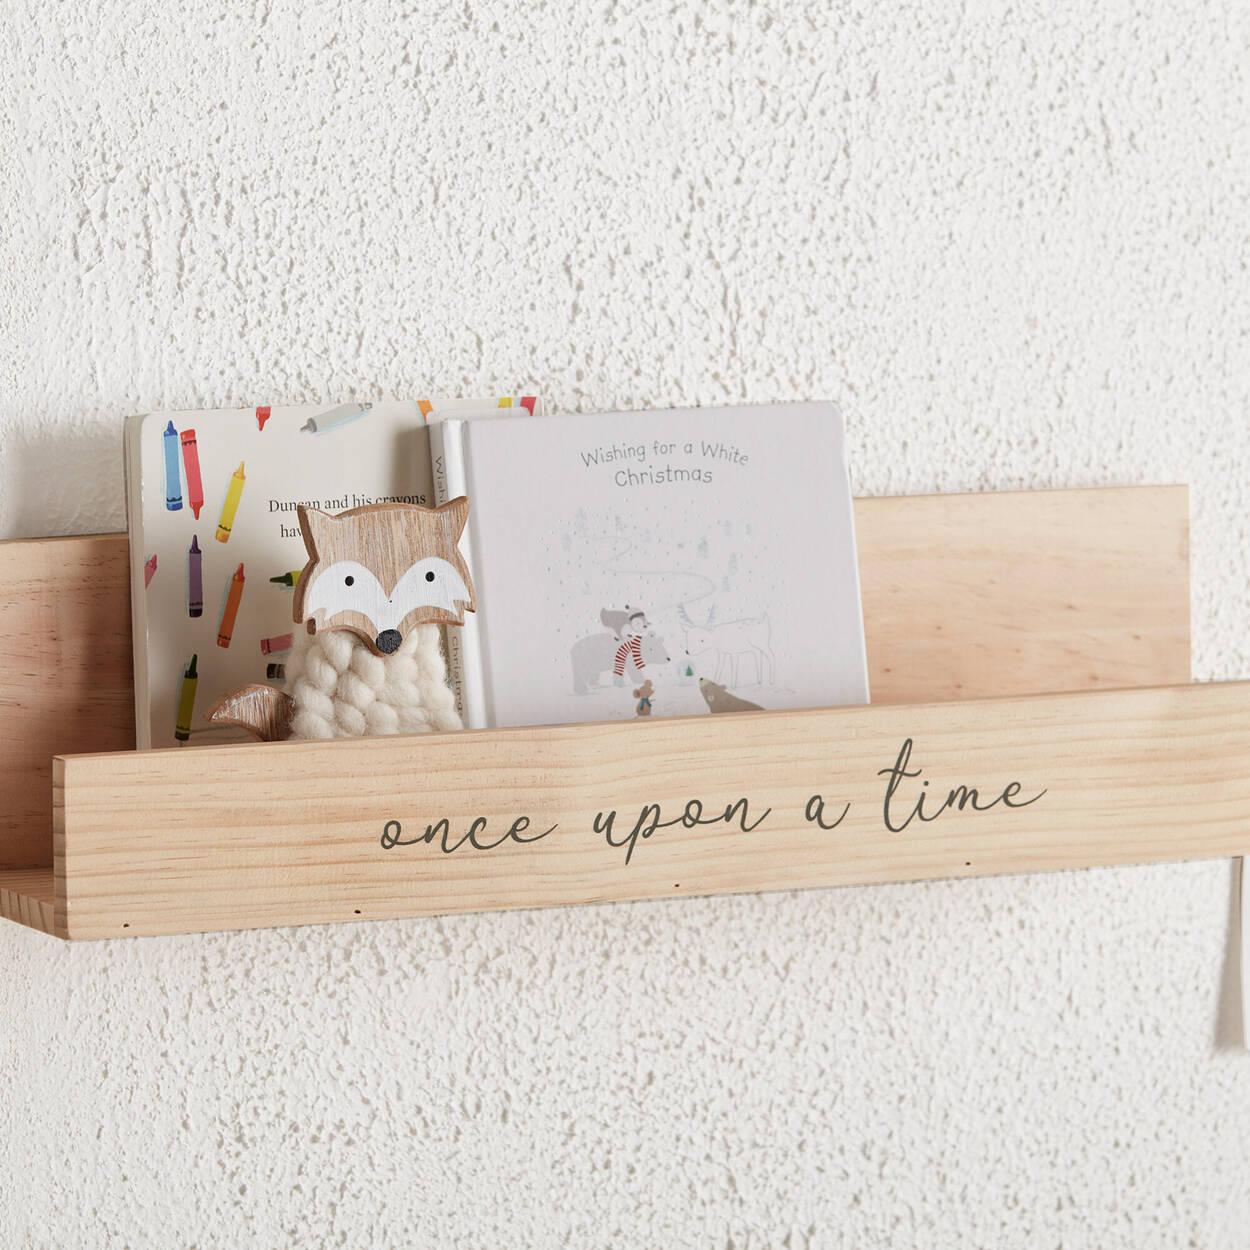 Once Upon a Time Shelf